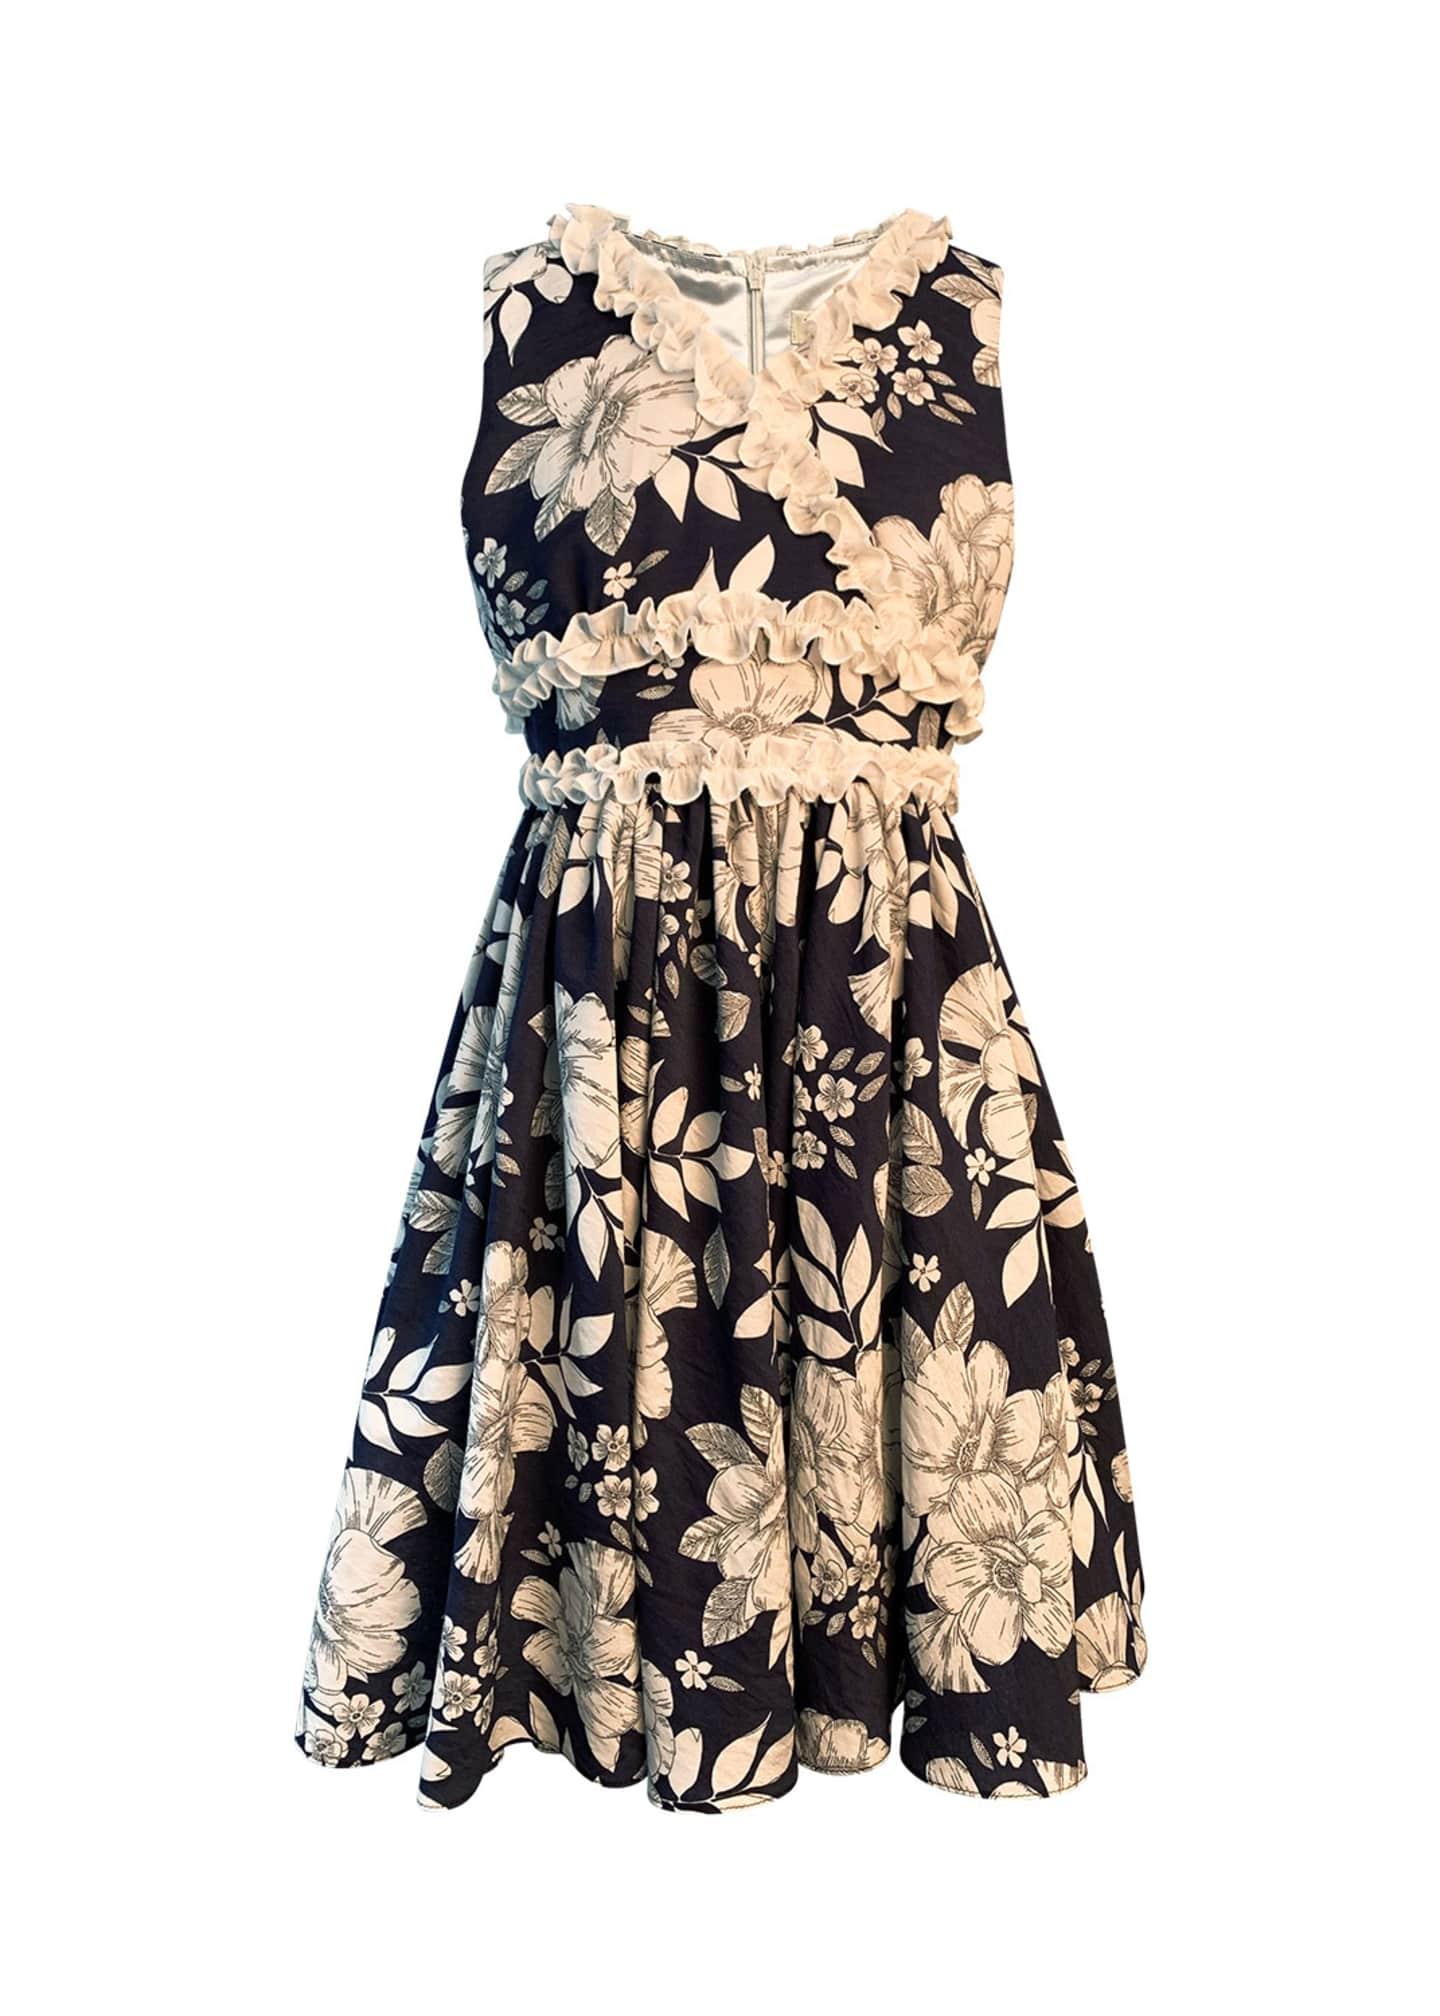 Helena Girl's Floral-Print Dress w/ Ruffle Trim, Size